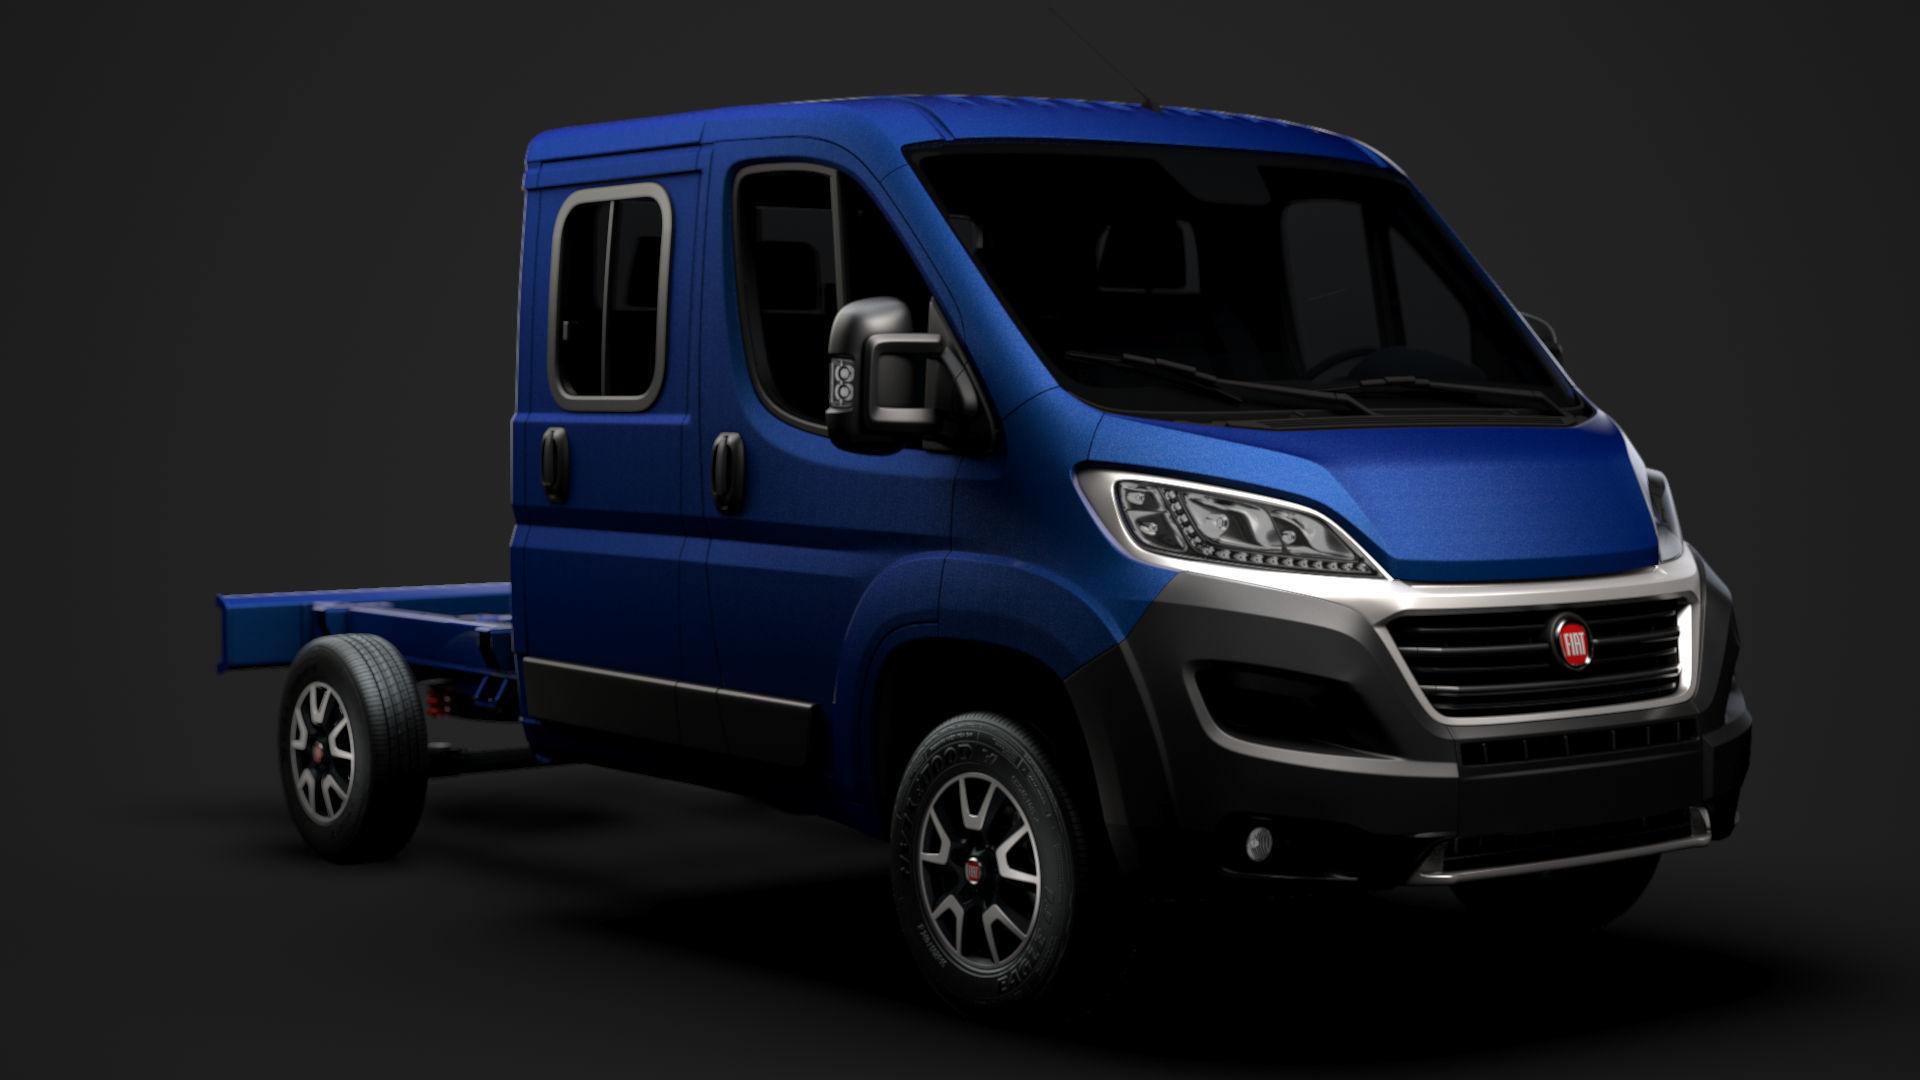 Fiat Ducato Chassis Truck Crew Cab 3450 WB 2020